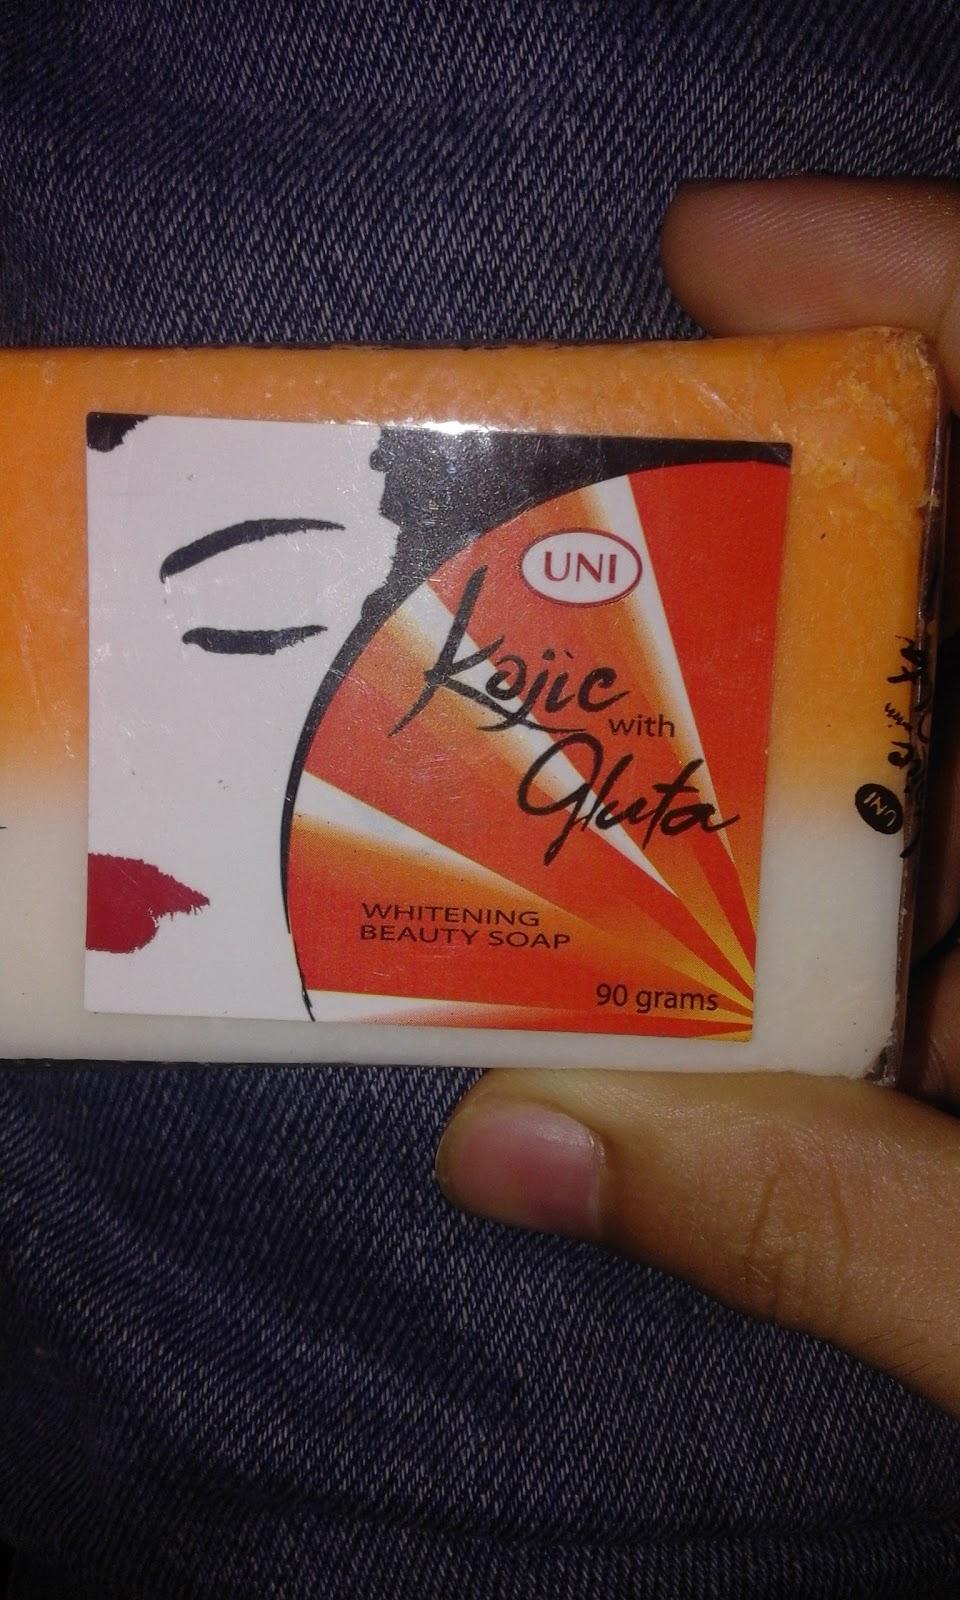 Kojic with Gluta Lightening Soap Review 2016 - Cyrus Arnaiz